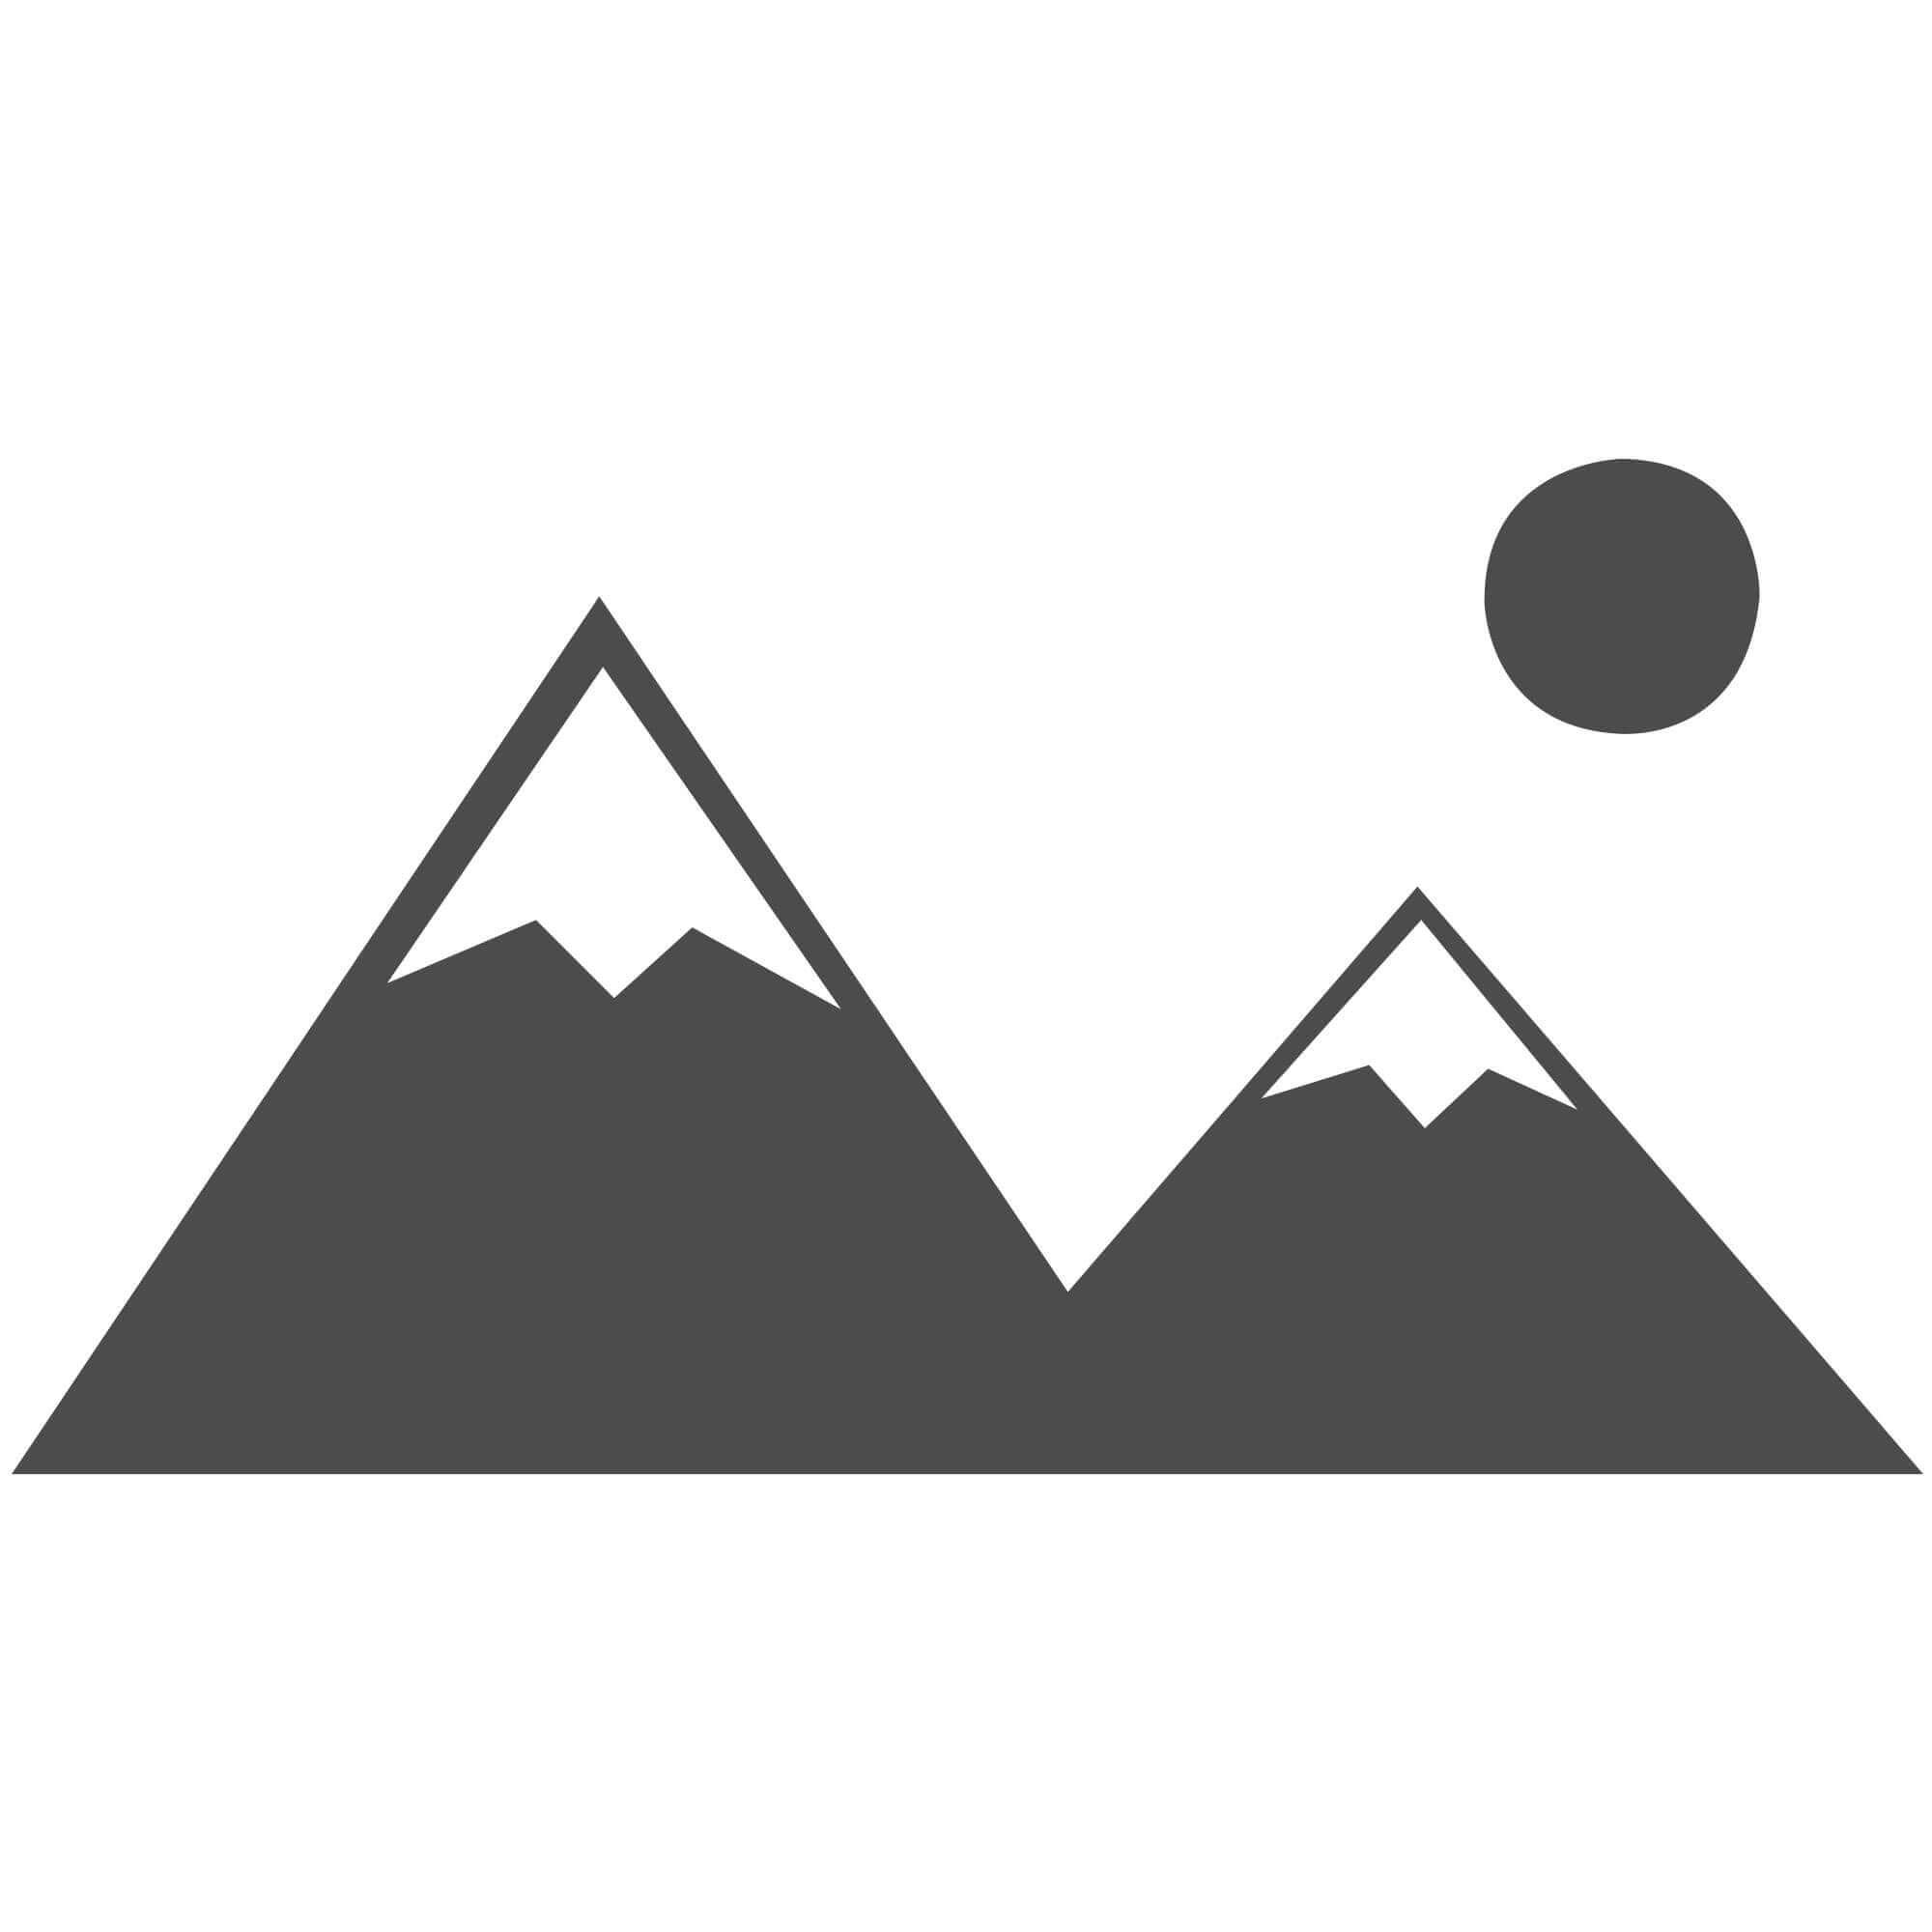 "Galleria Rug - Triangles 63263 5161 - Size 133 x 195 cm (4'4"" x 6'5"")"